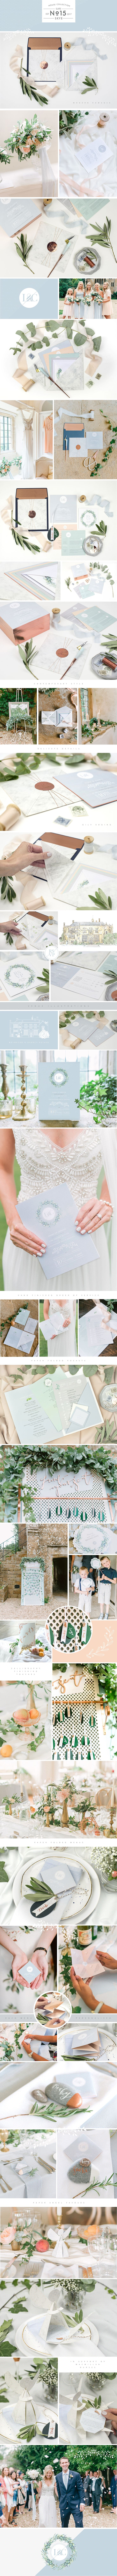 Paperknots stylish, minimalist, modern, pastel, copper, wedding stationery http://www.paperknots.co.uk/portfolio/skye/